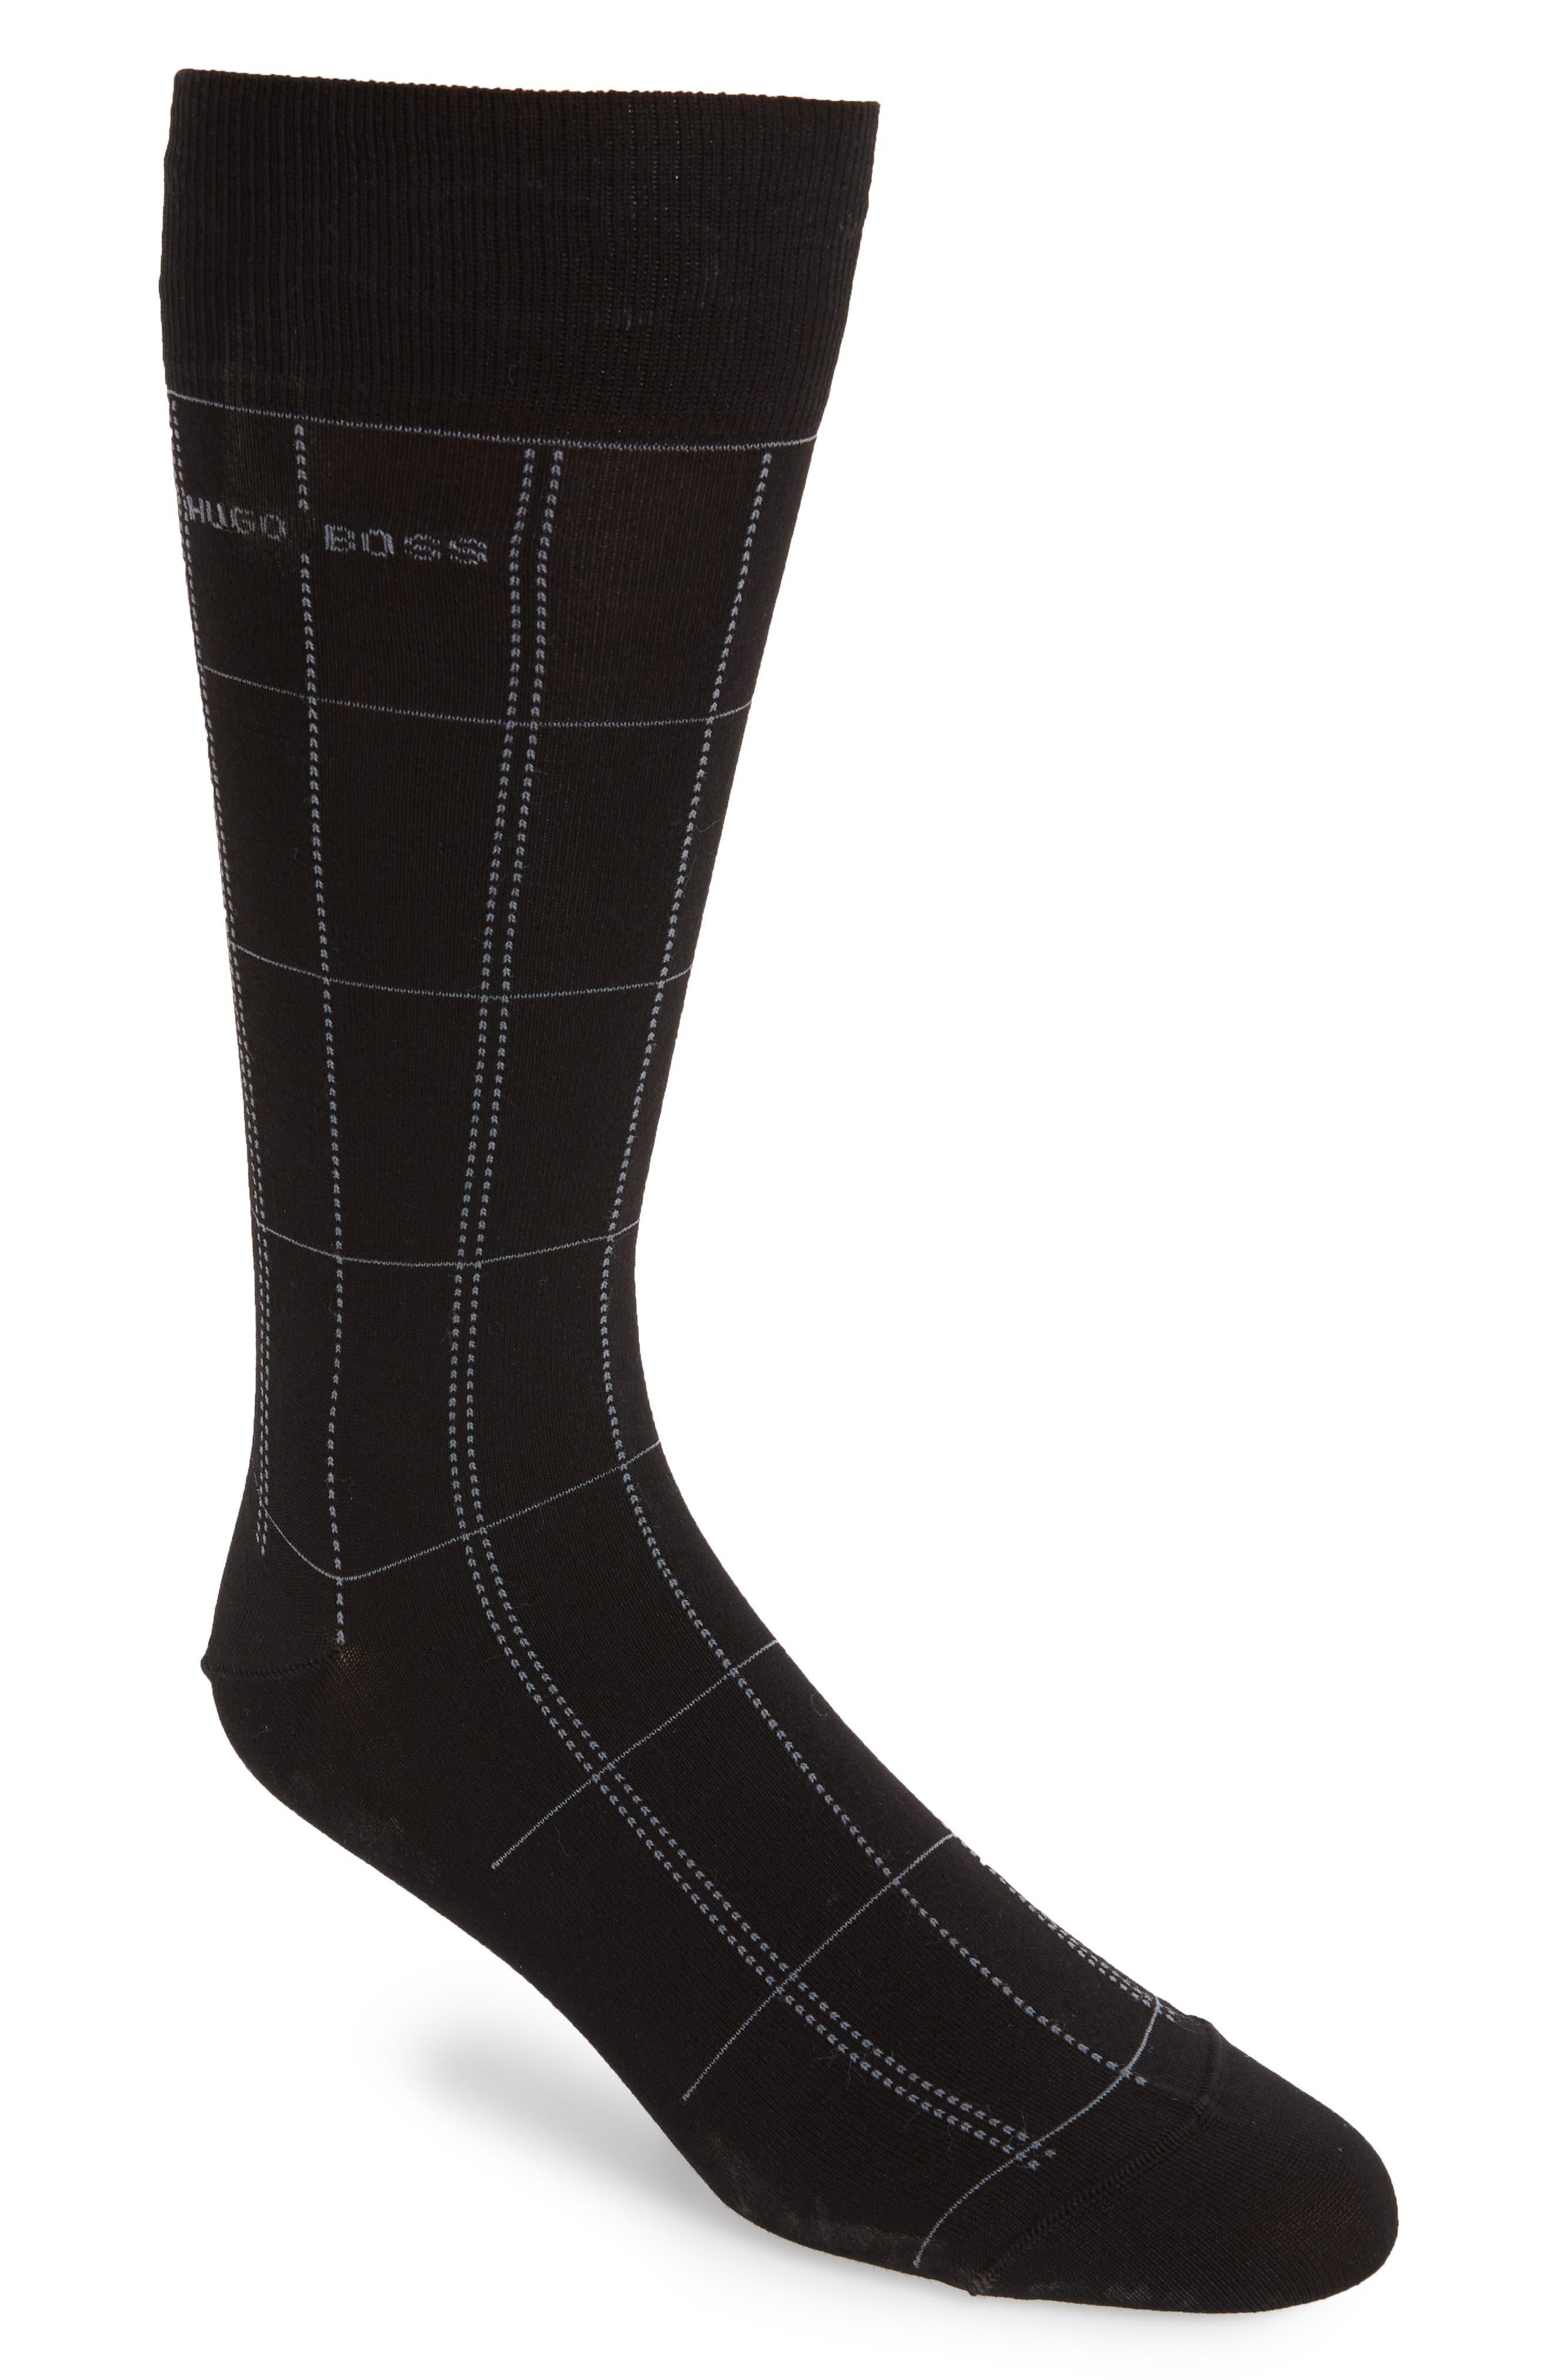 Check Socks,                         Main,                         color, Black